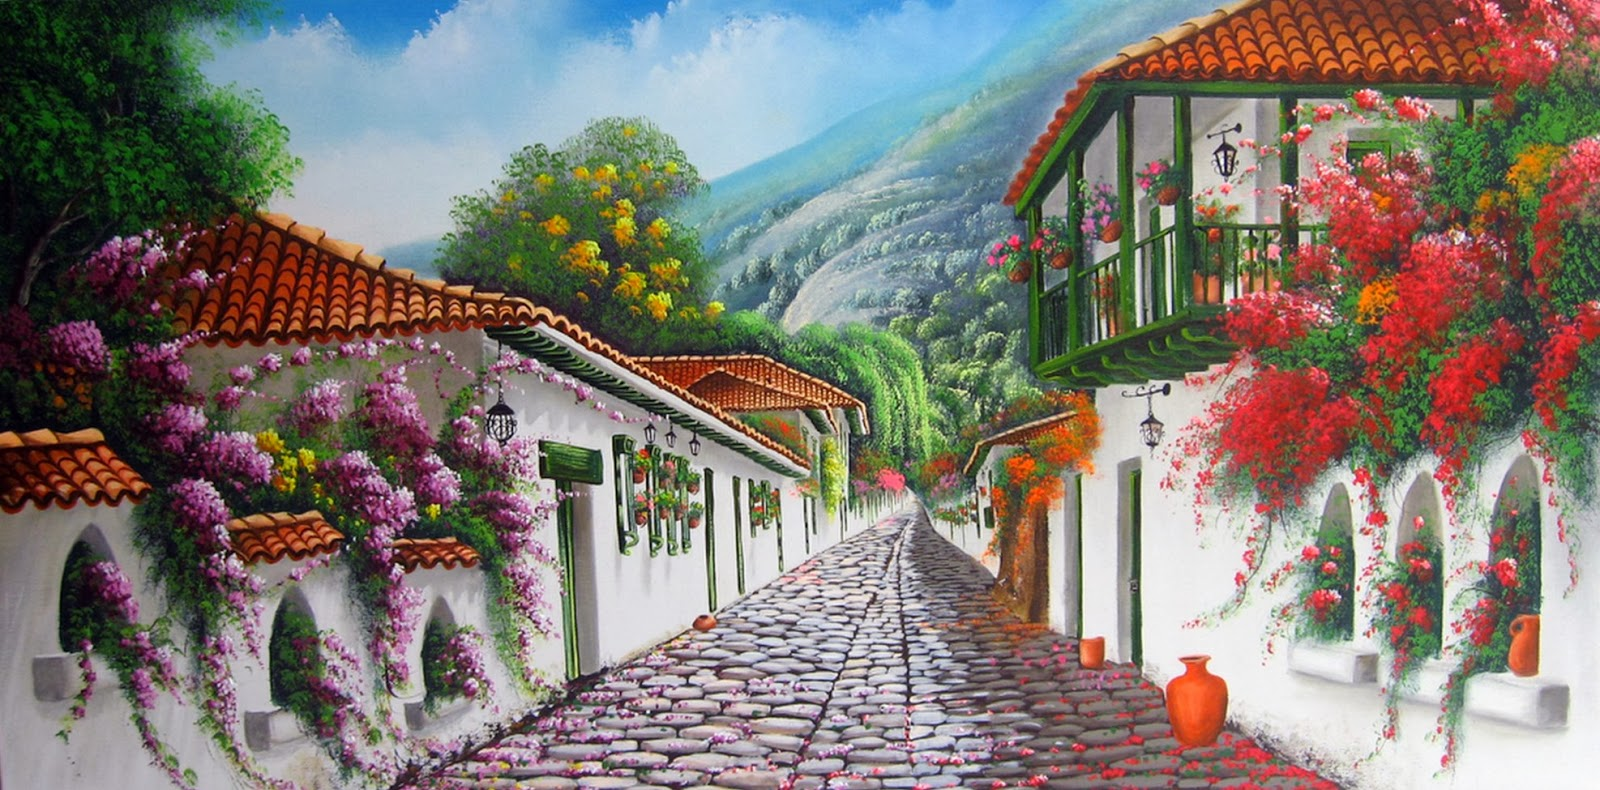 Pintura moderna y fotograf a art stica pintores de for Cuadros mexicanos rusticos